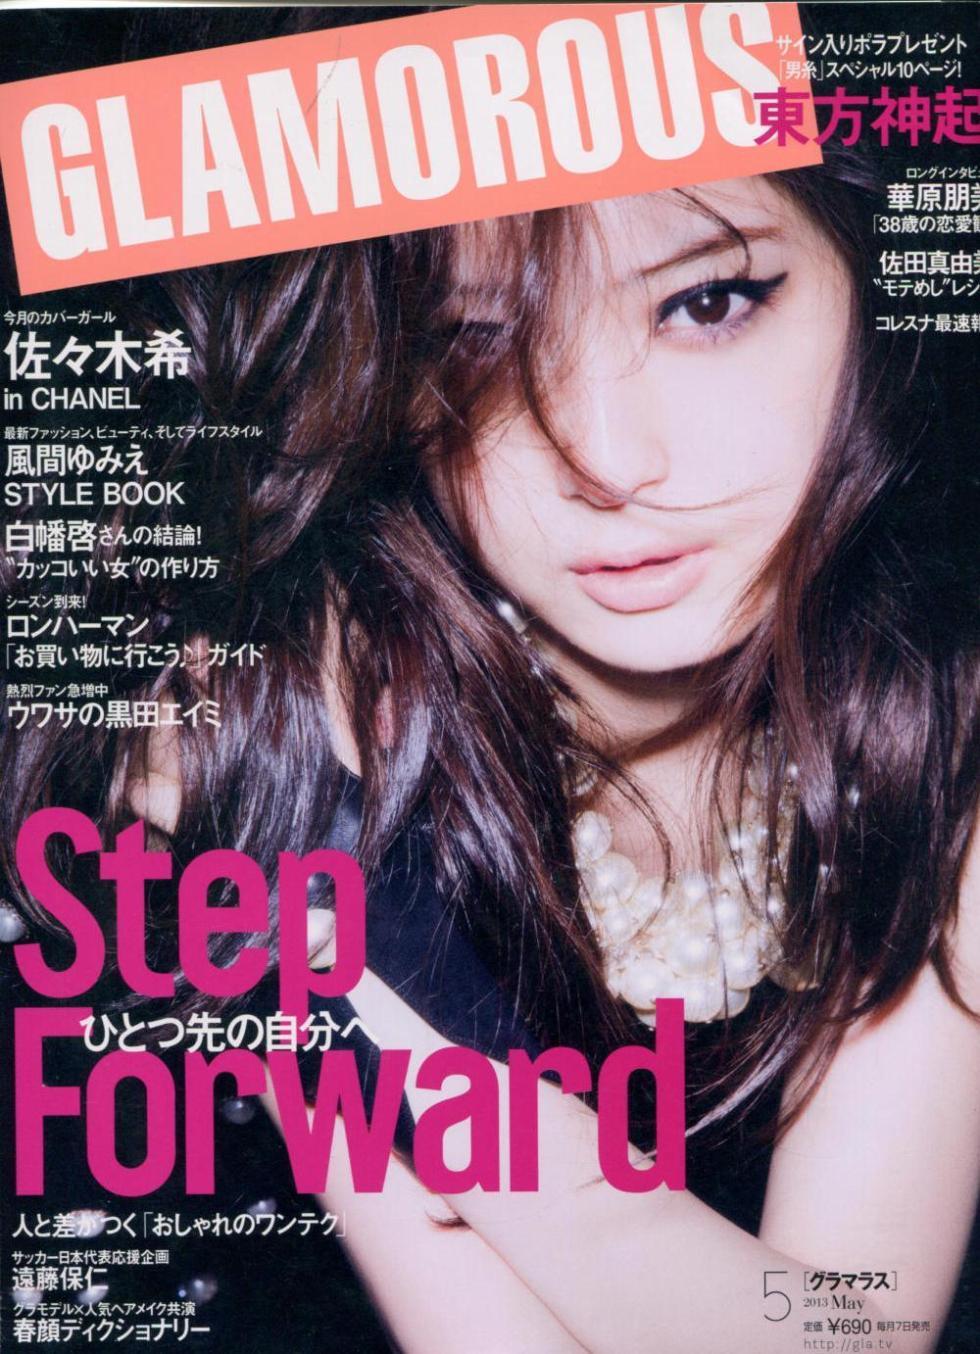 Glamorous JAP 2013-5-1 Cover